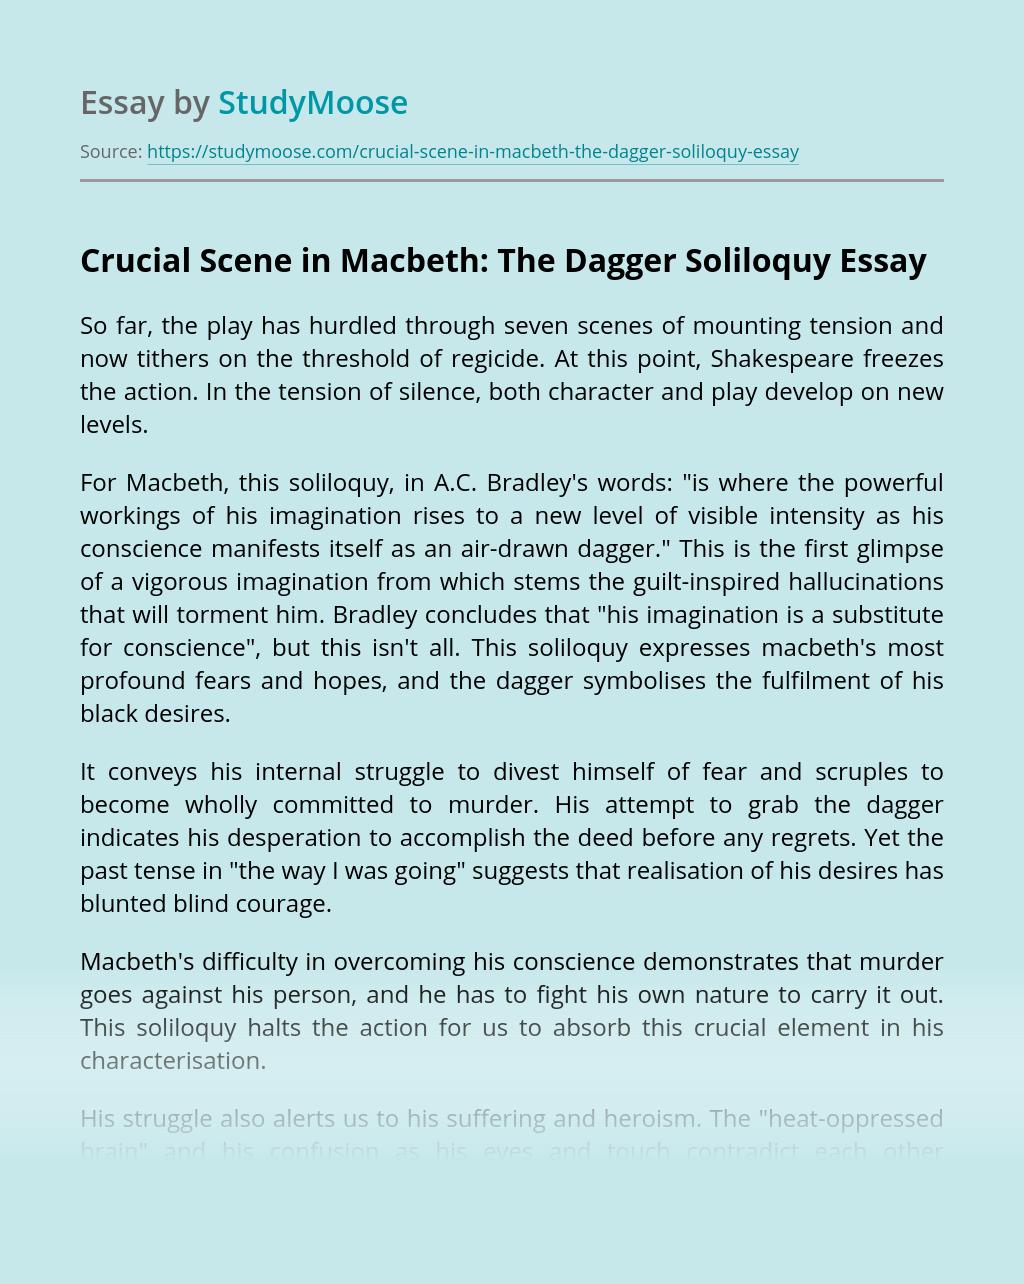 Crucial Scene in Macbeth: The Dagger Soliloquy